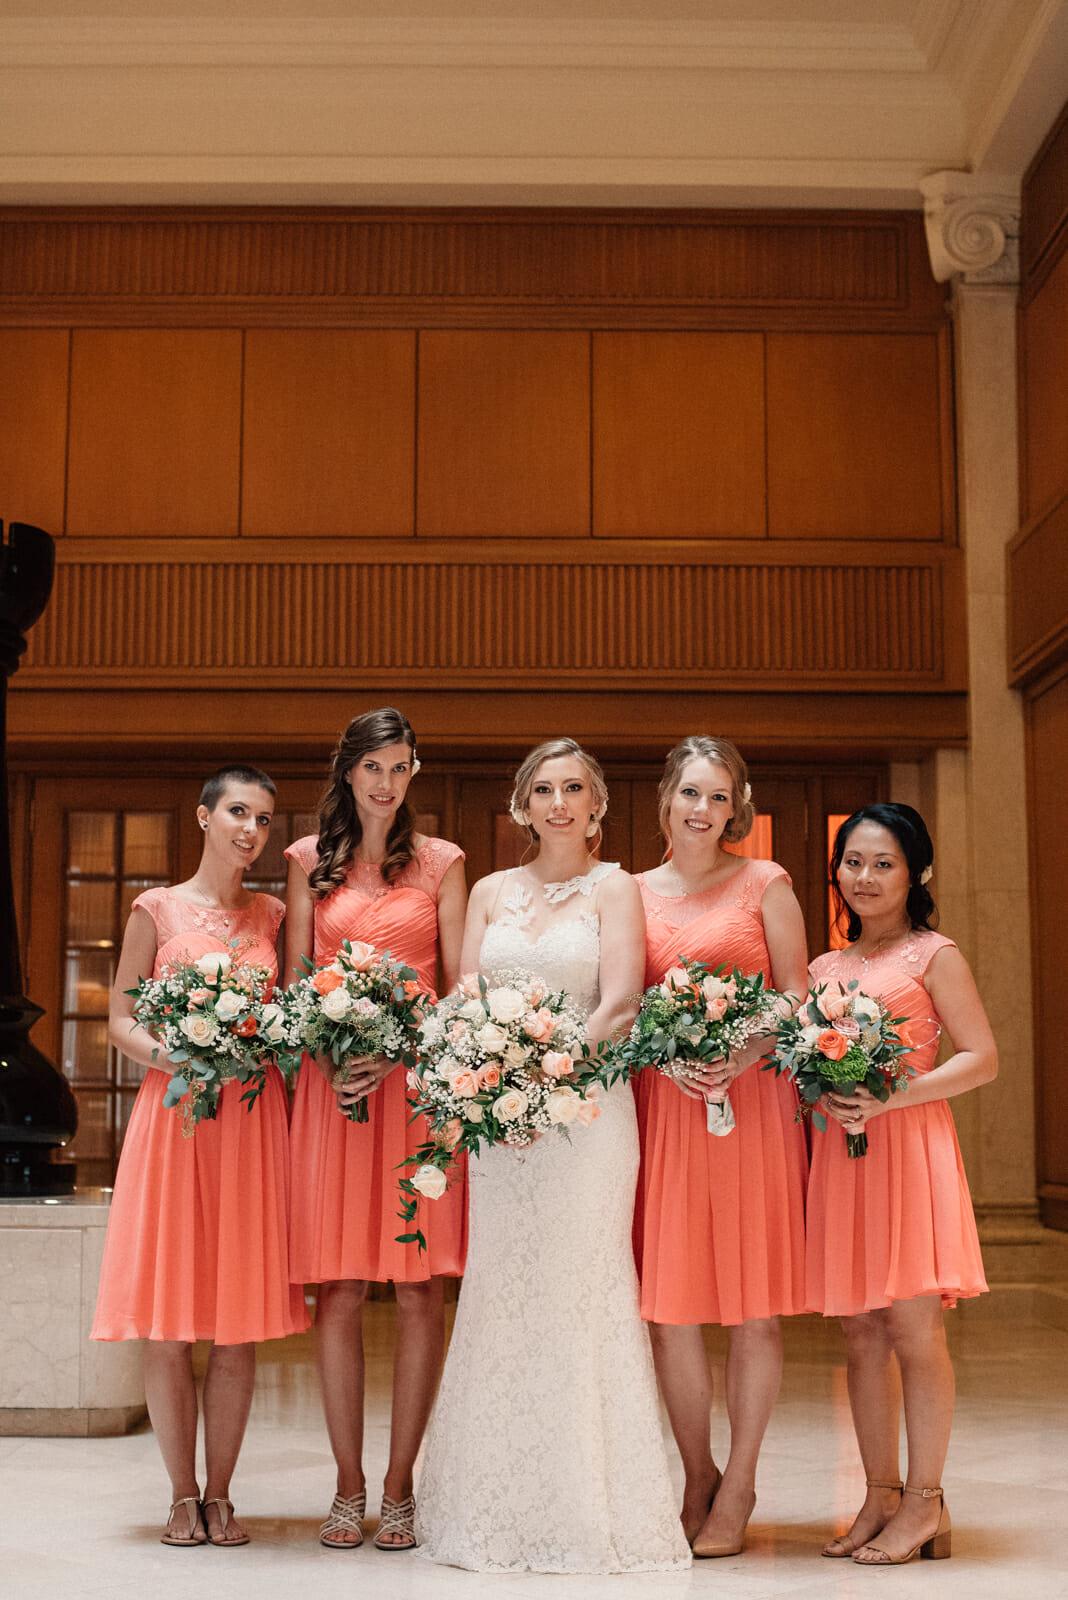 bridal party photos in the king edward hotel toronto